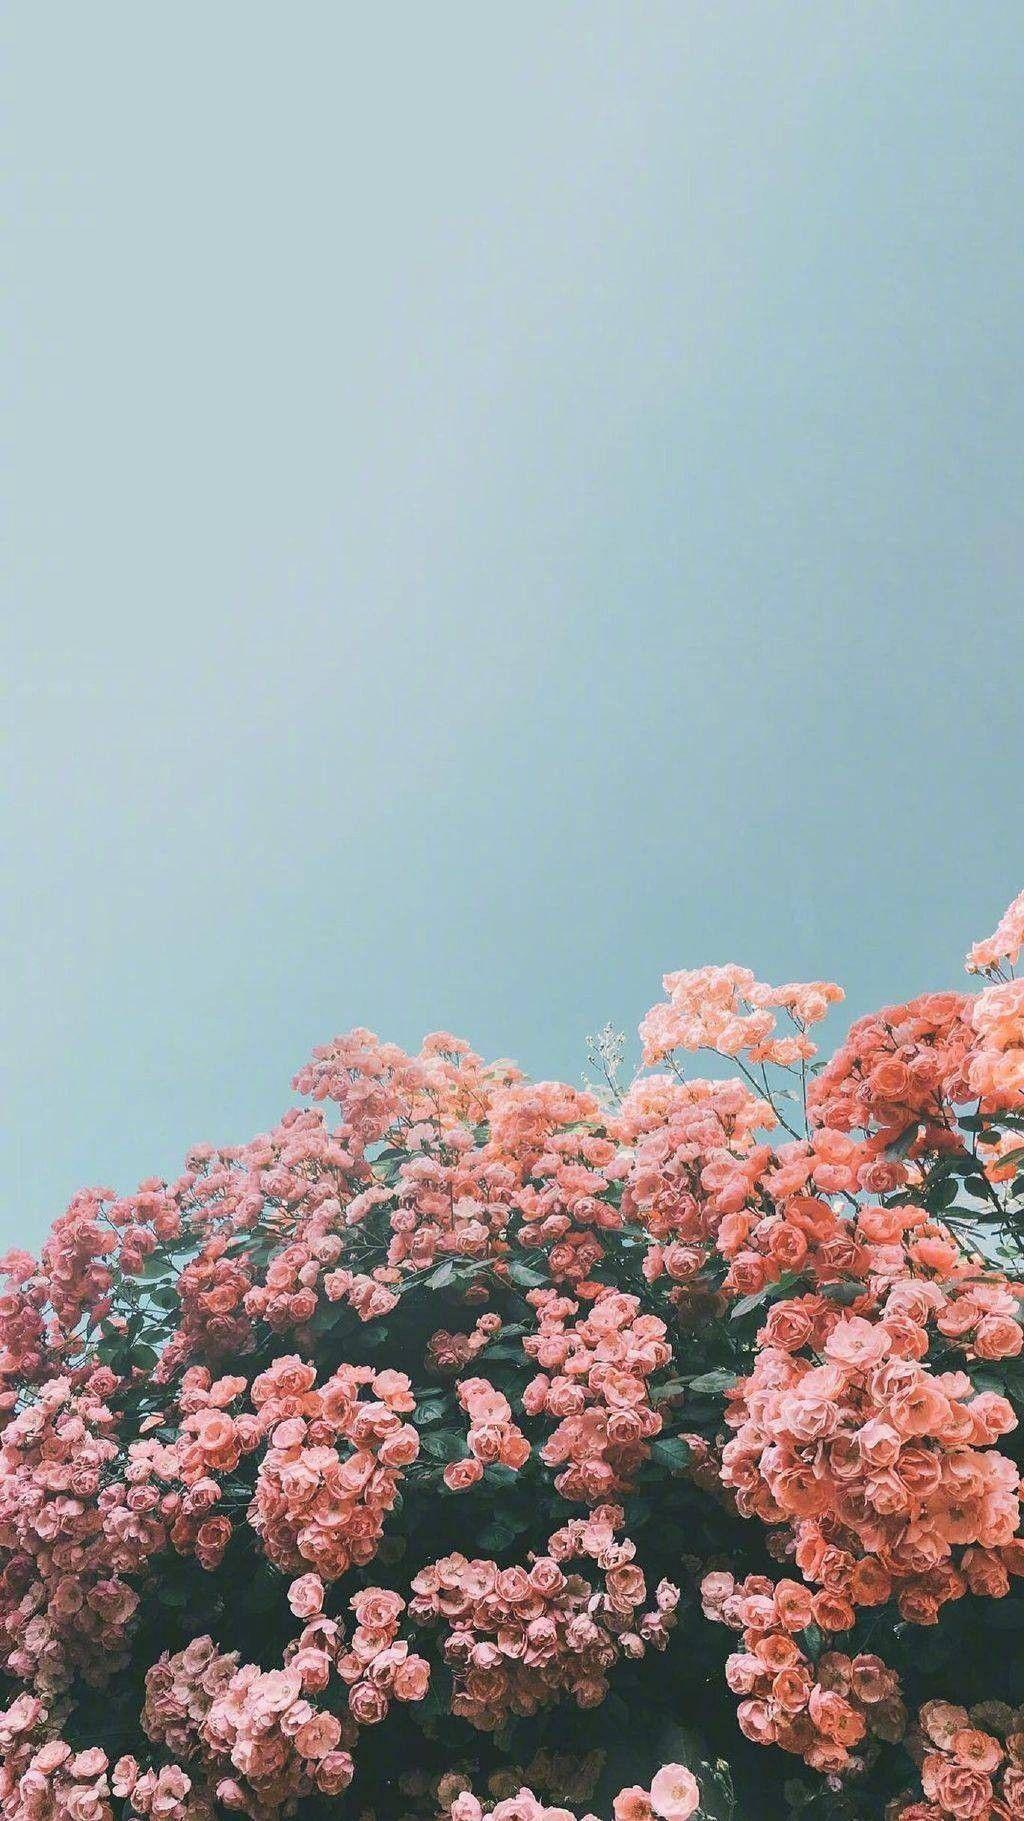 100 Beautiful iPhone wallpaper iphone background summer flower 1024x1821